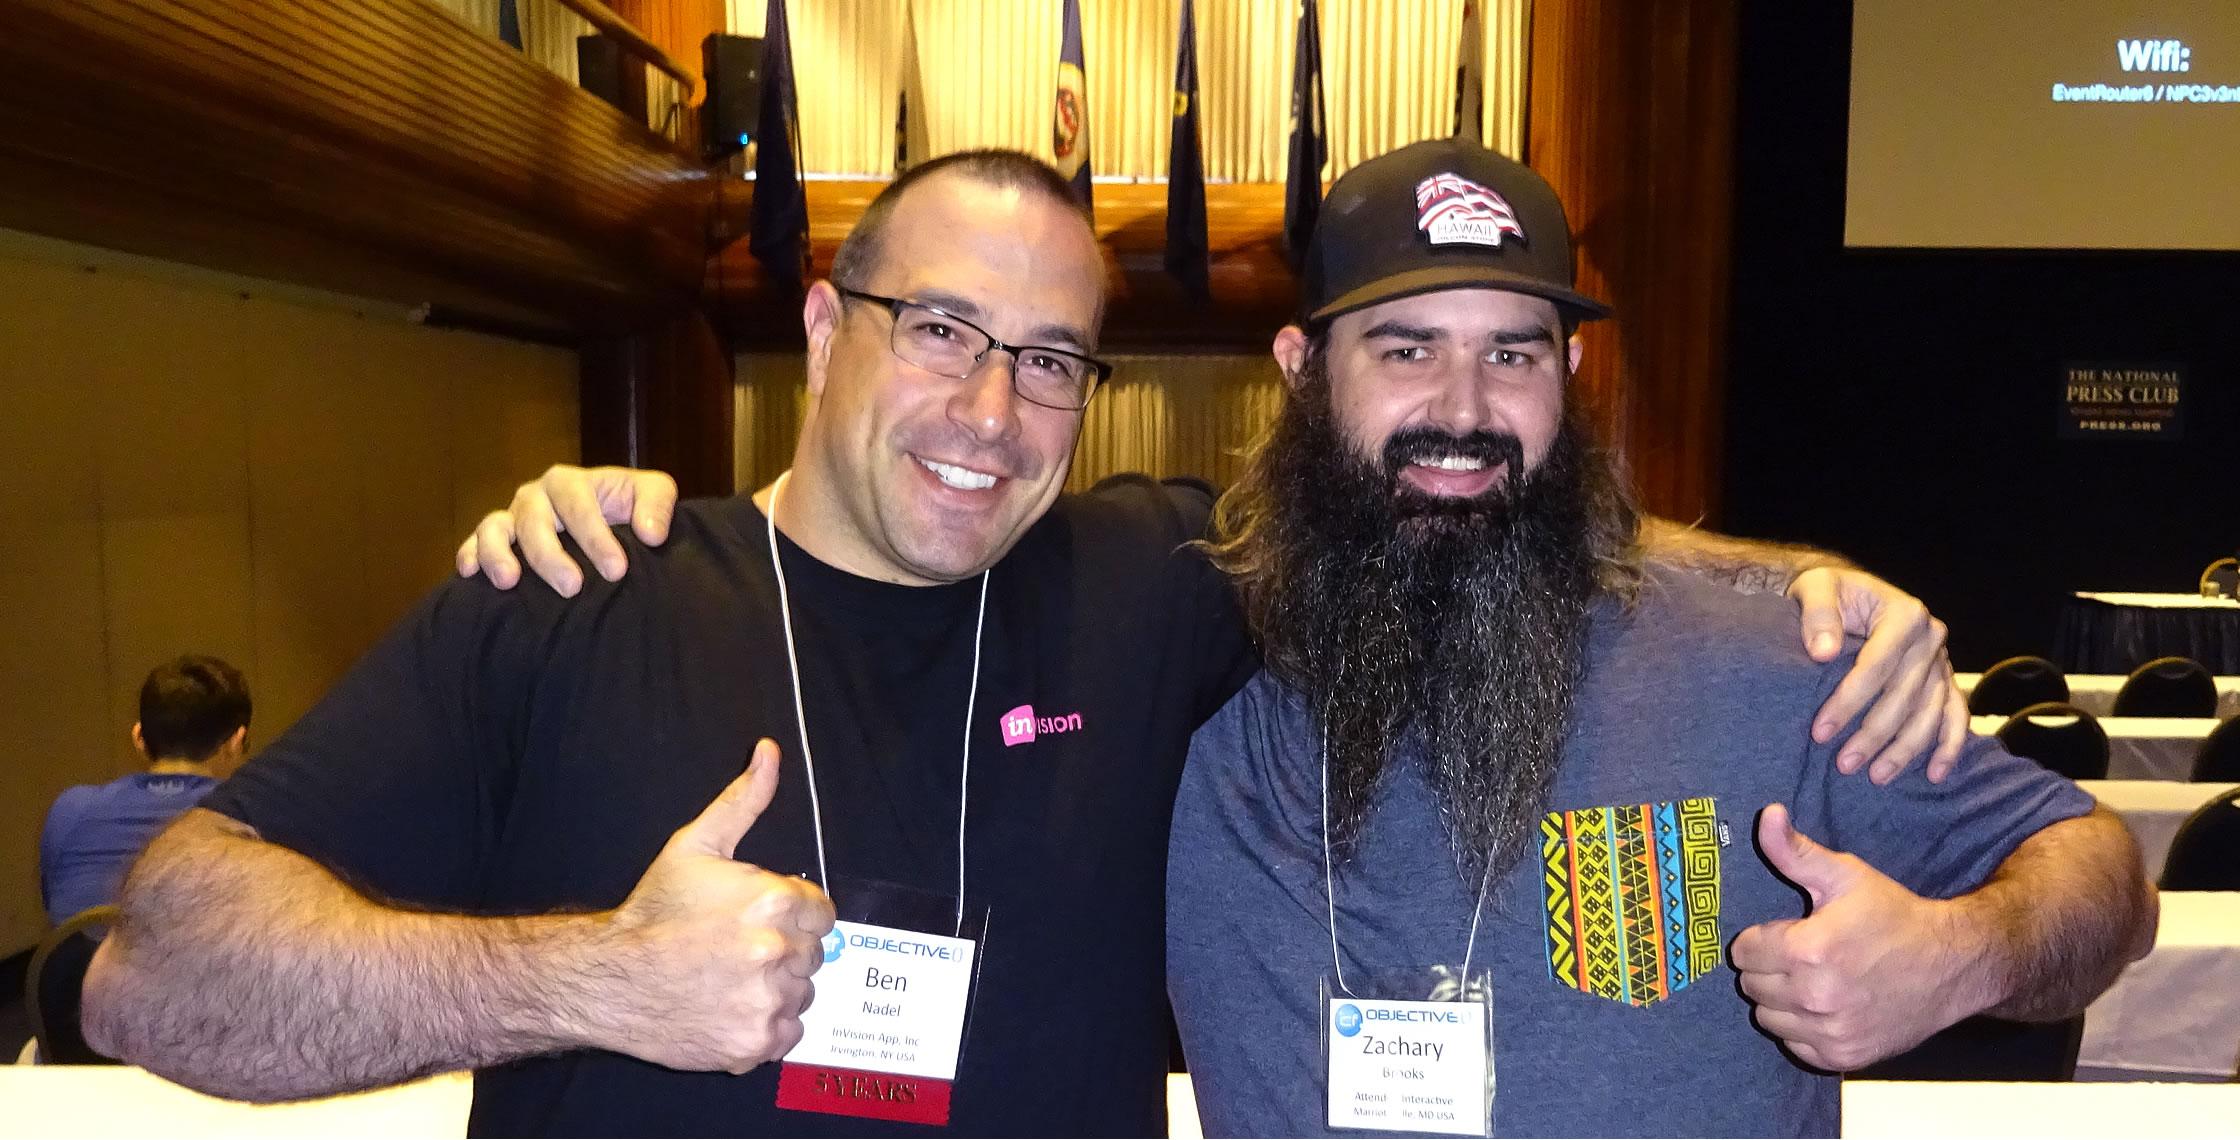 Ben Nadel at cf.Objective() 2017 (Washington, D.C.) with: Zachary Brooks